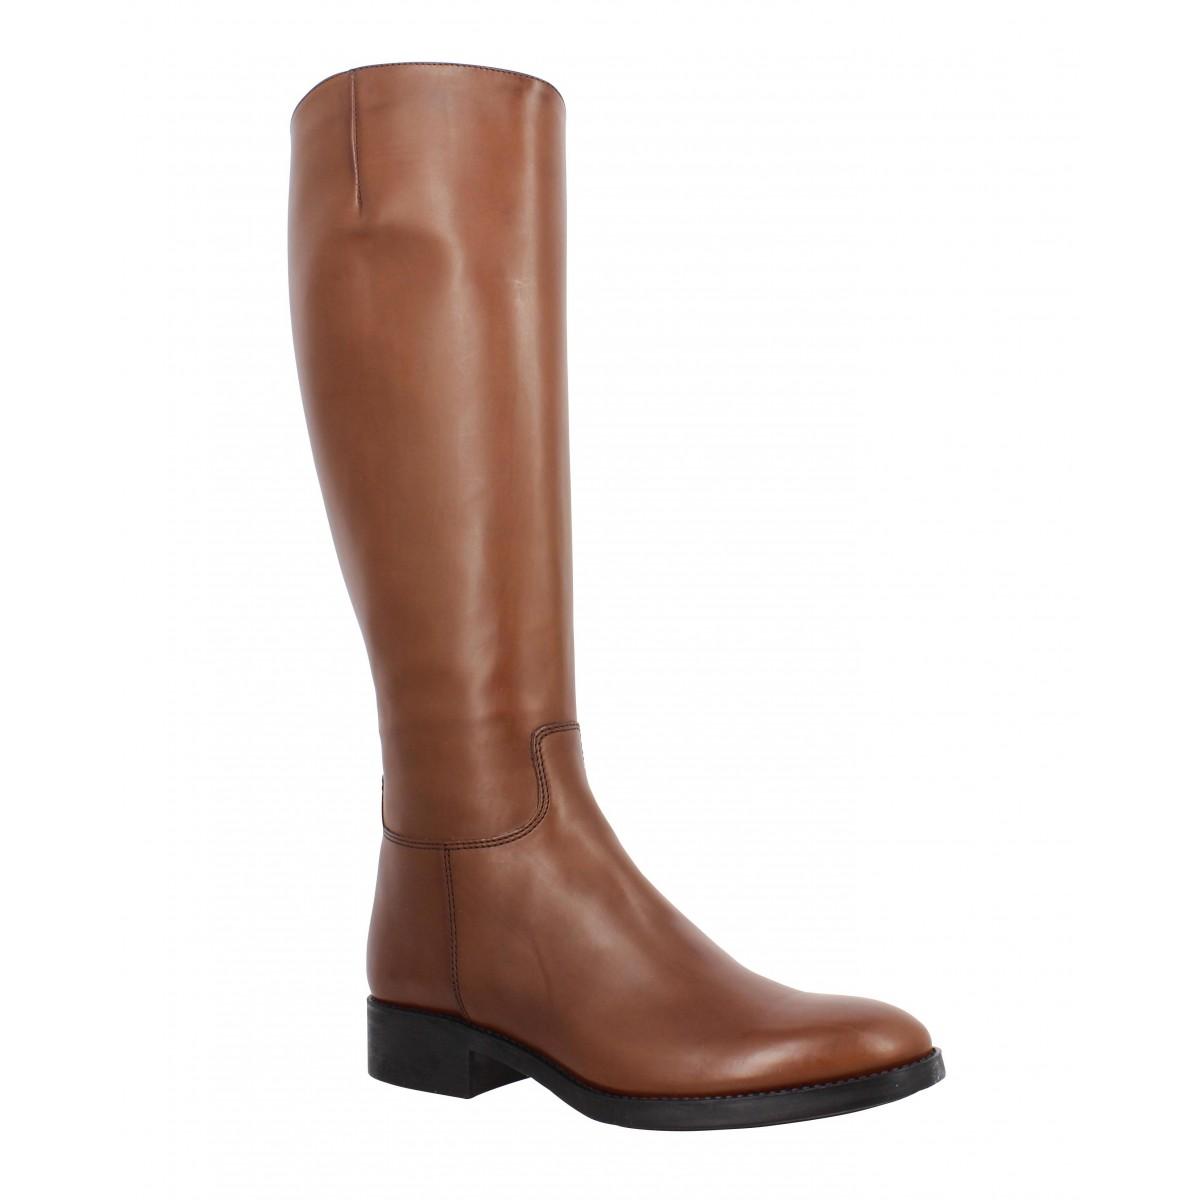 22 cognac cuir femme Fanny flight chaussures 920 Triver wqxnTSEX